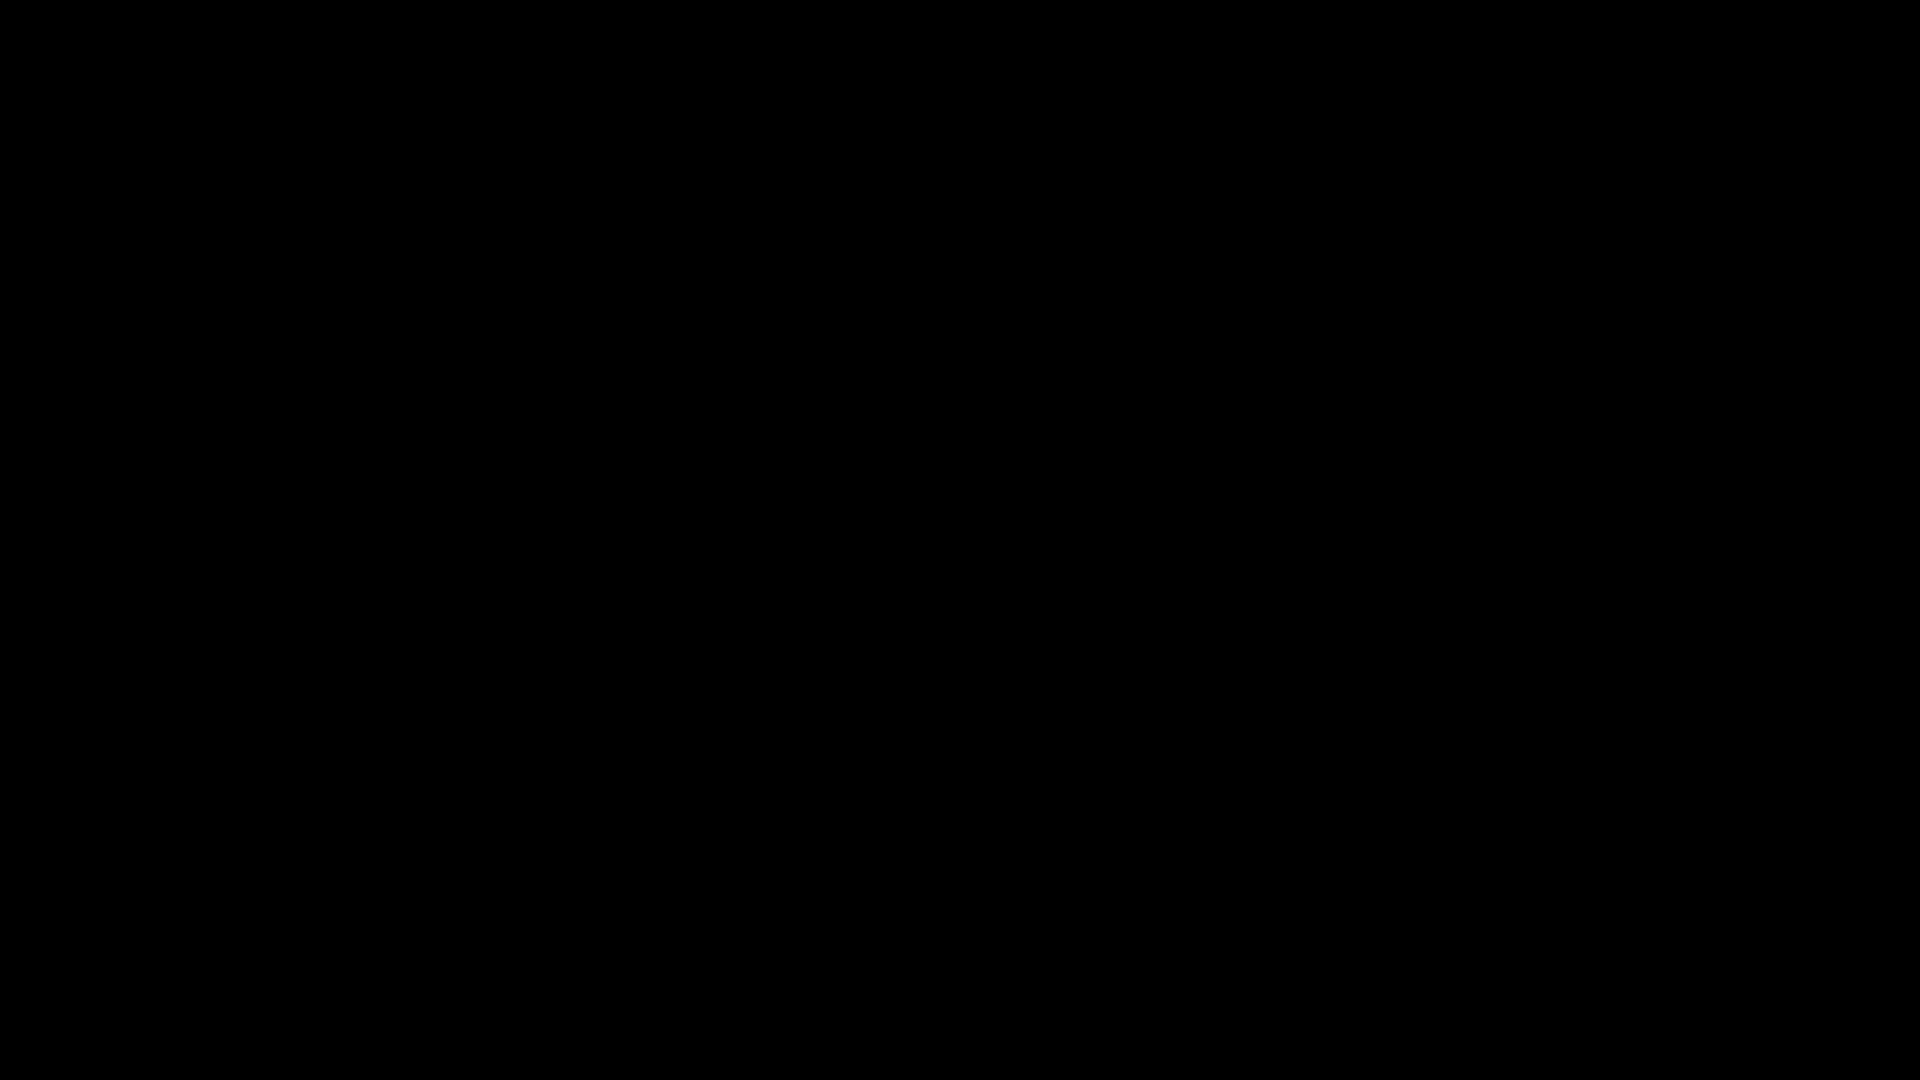 … Background Full HD 1080p. Wallpaper nike, logo, symbol,  white, black